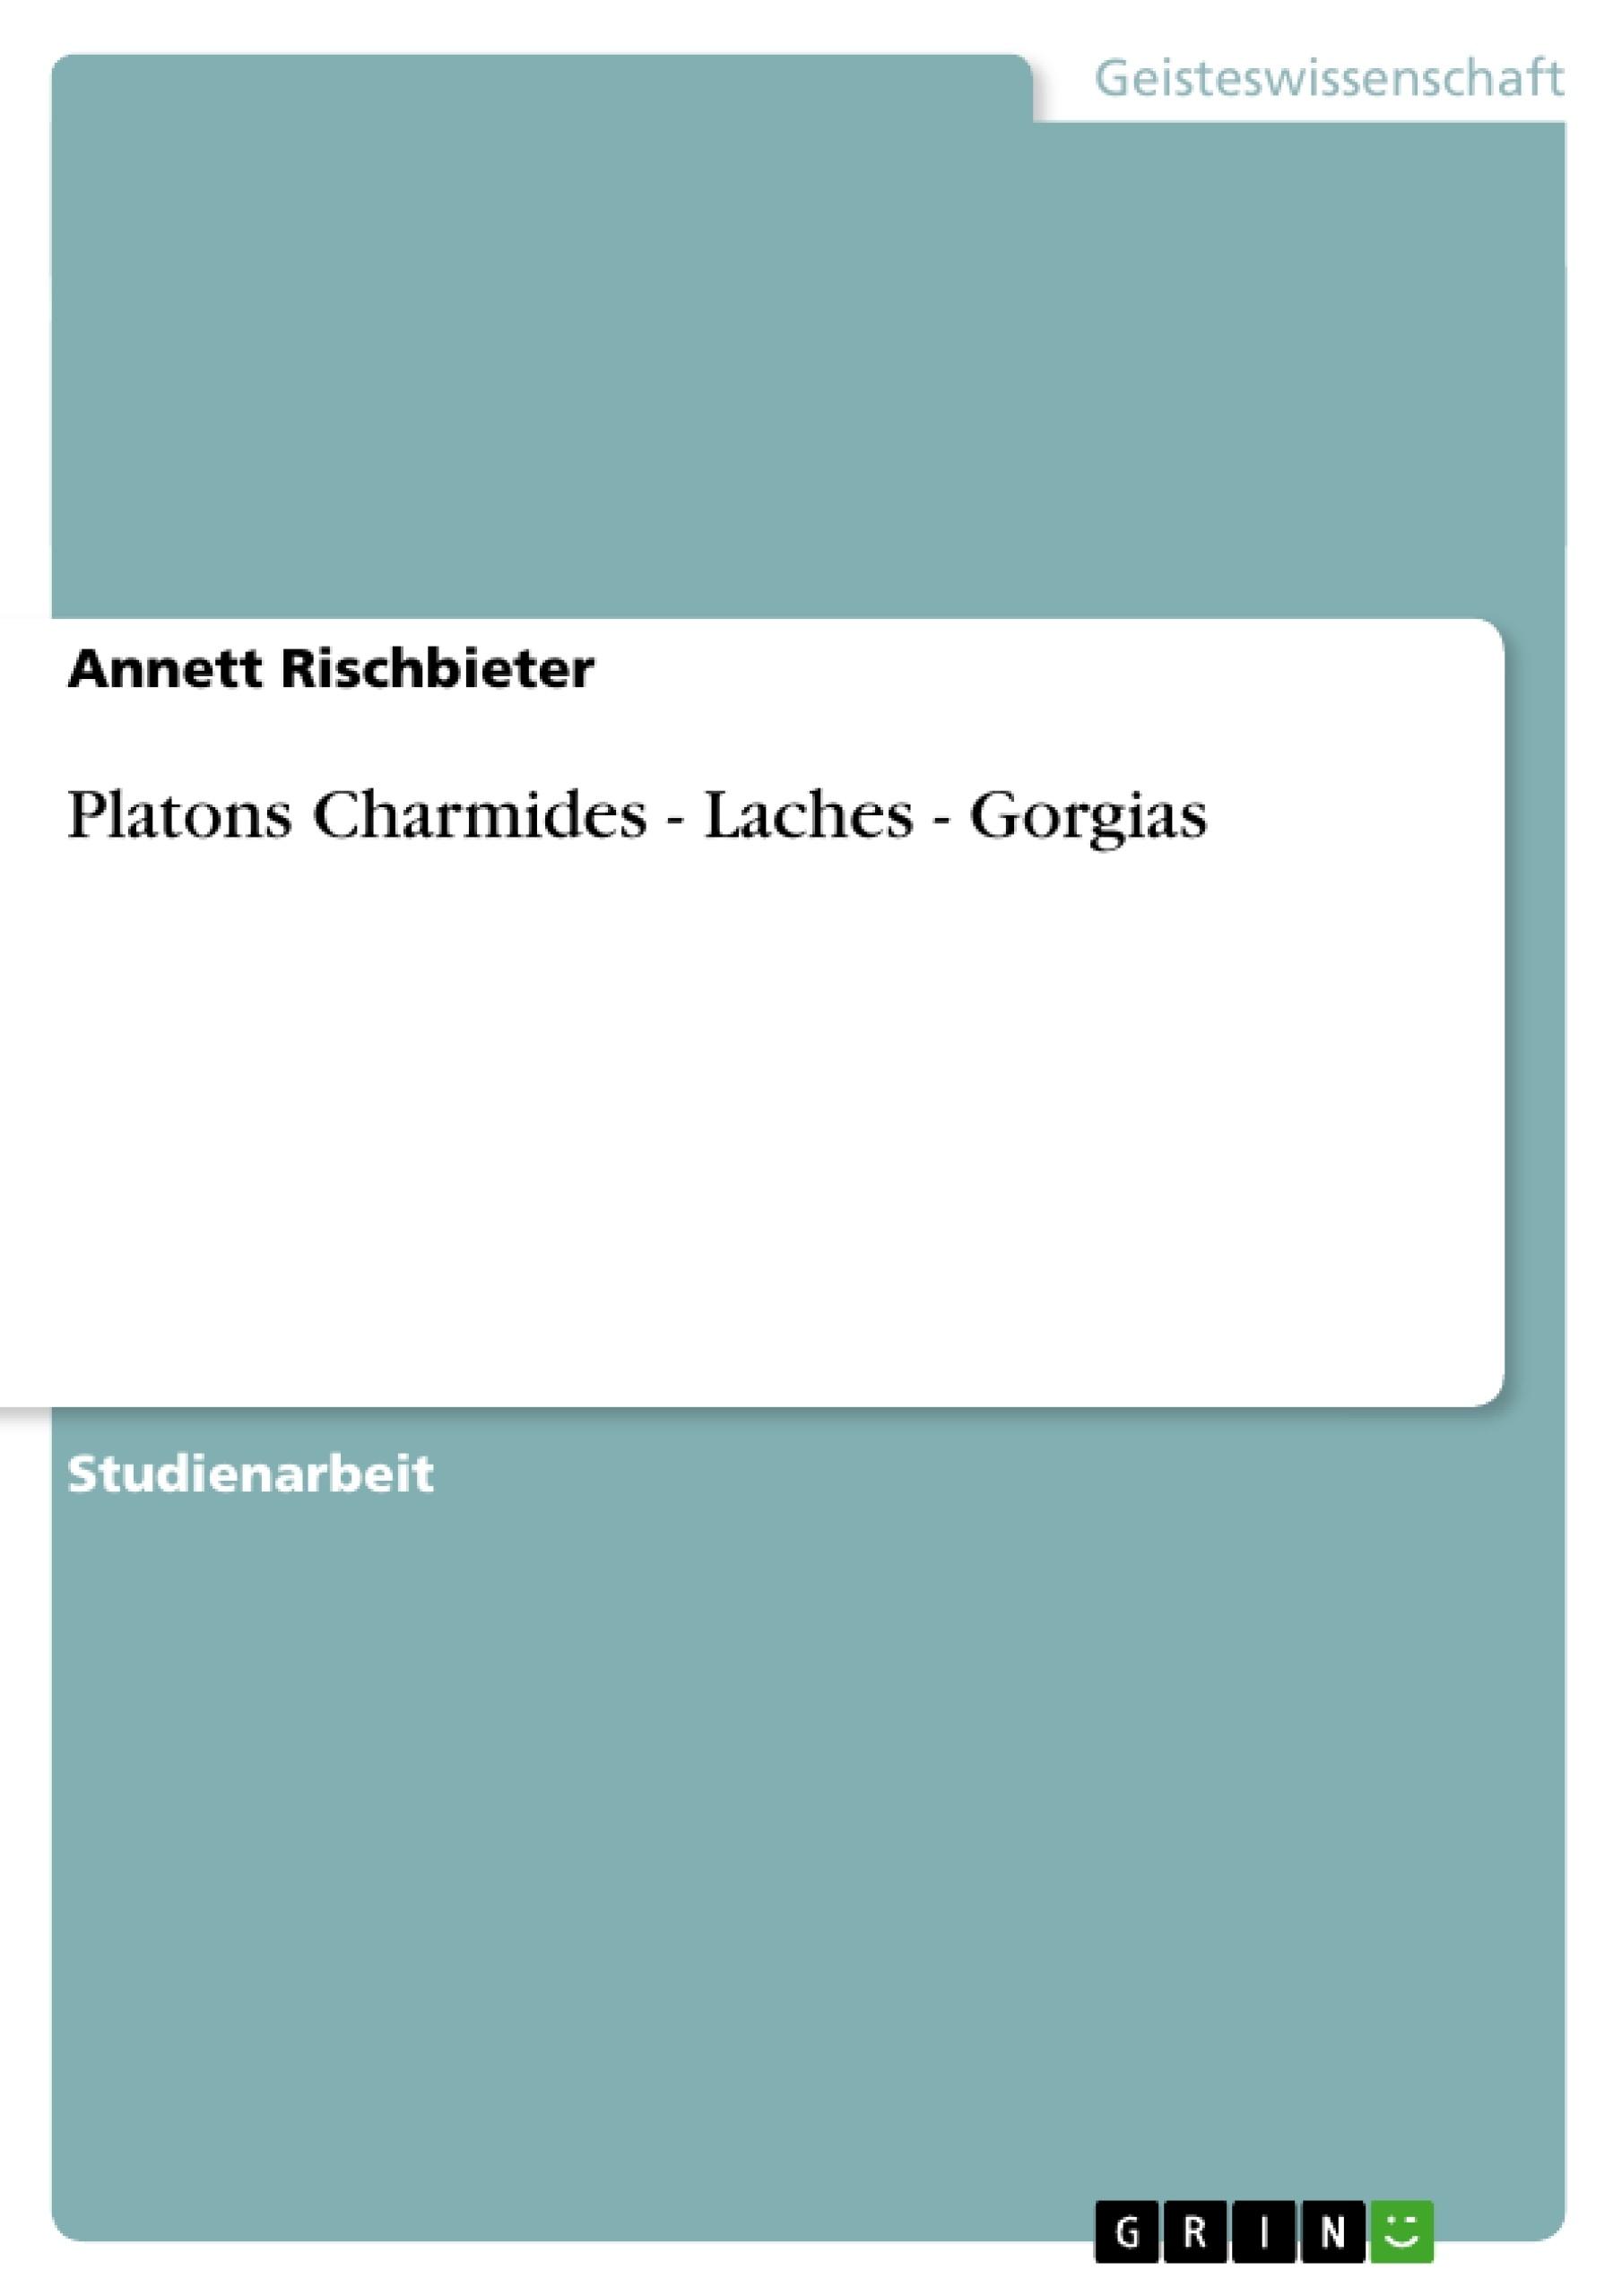 Titel: Platons  Charmides  -  Laches  -  Gorgias